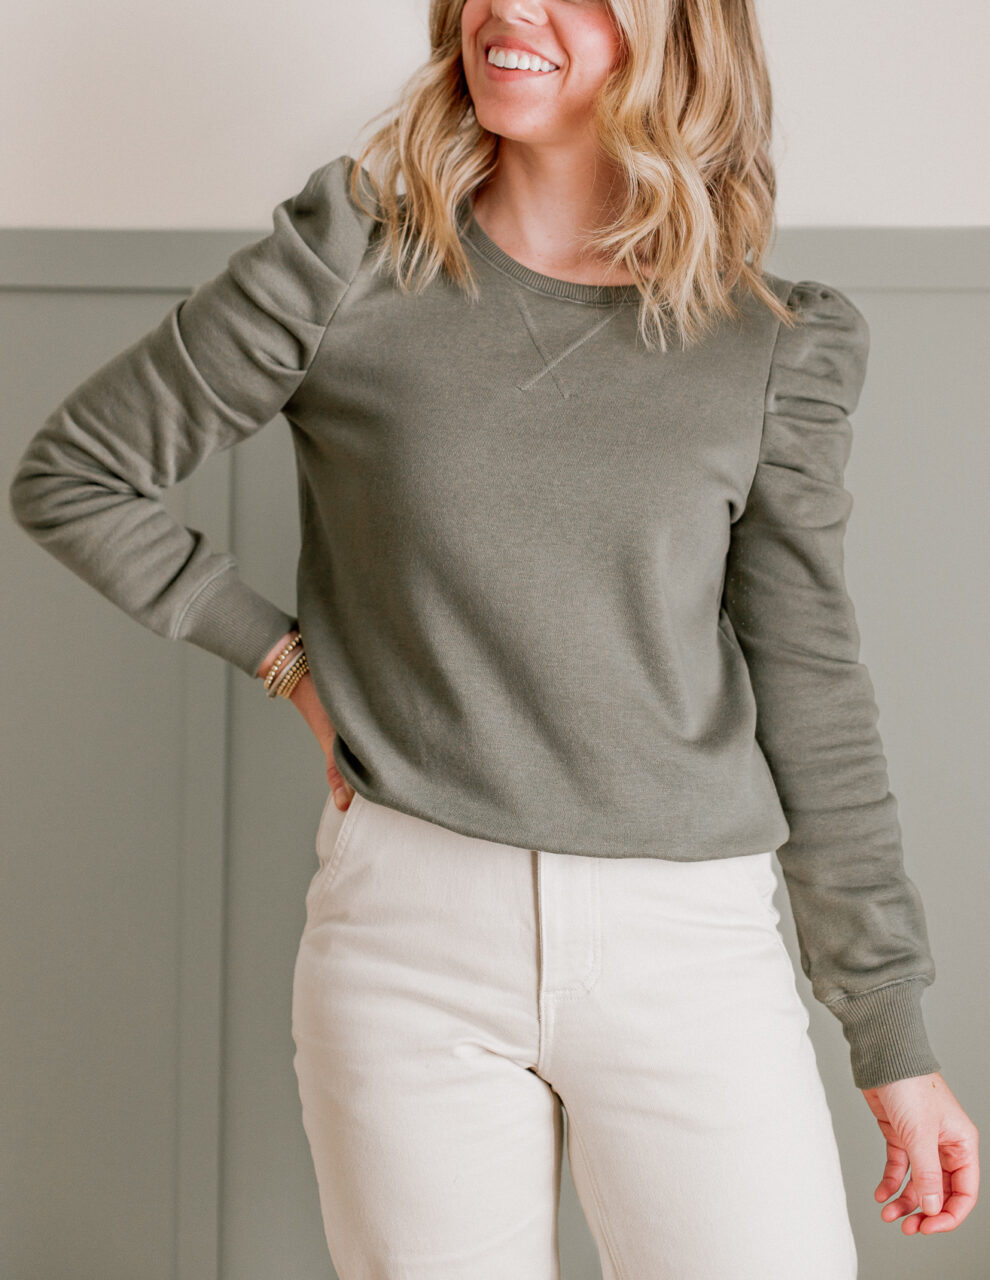 Puff Sleeve Sweatshirt | Janine Sweatshirt | Louella Reese